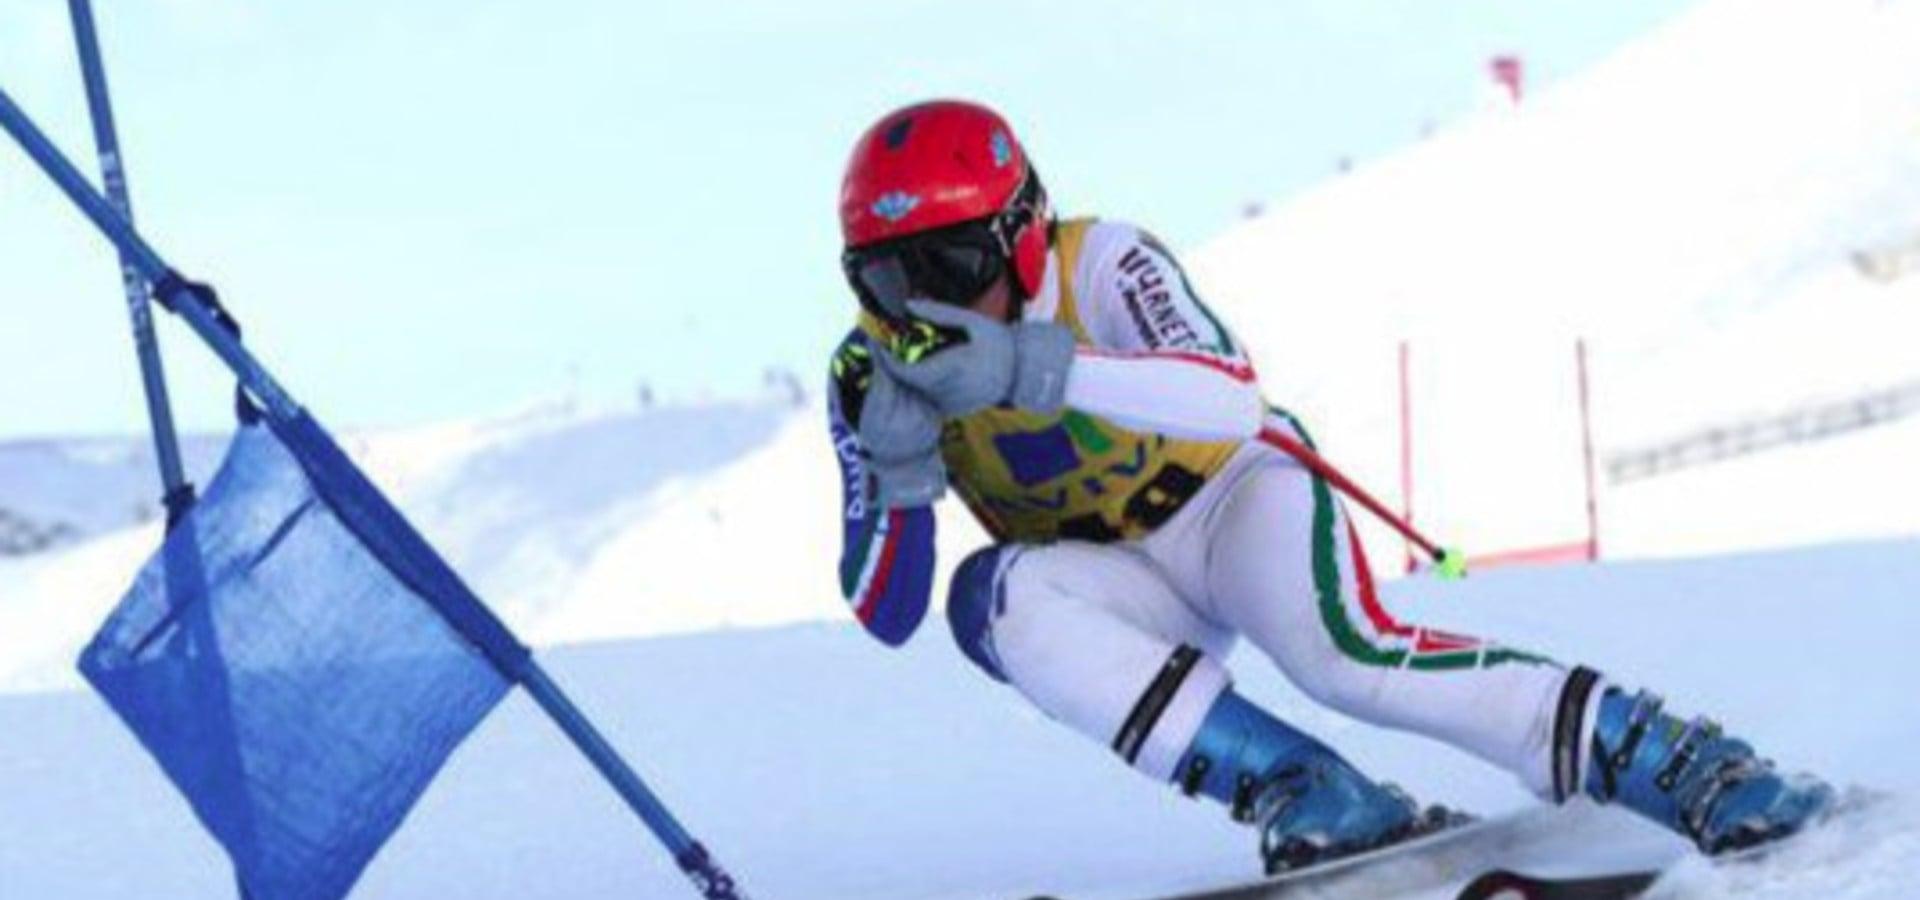 05.02.17 GP Ragazzi/Allievi Slalom Gigante